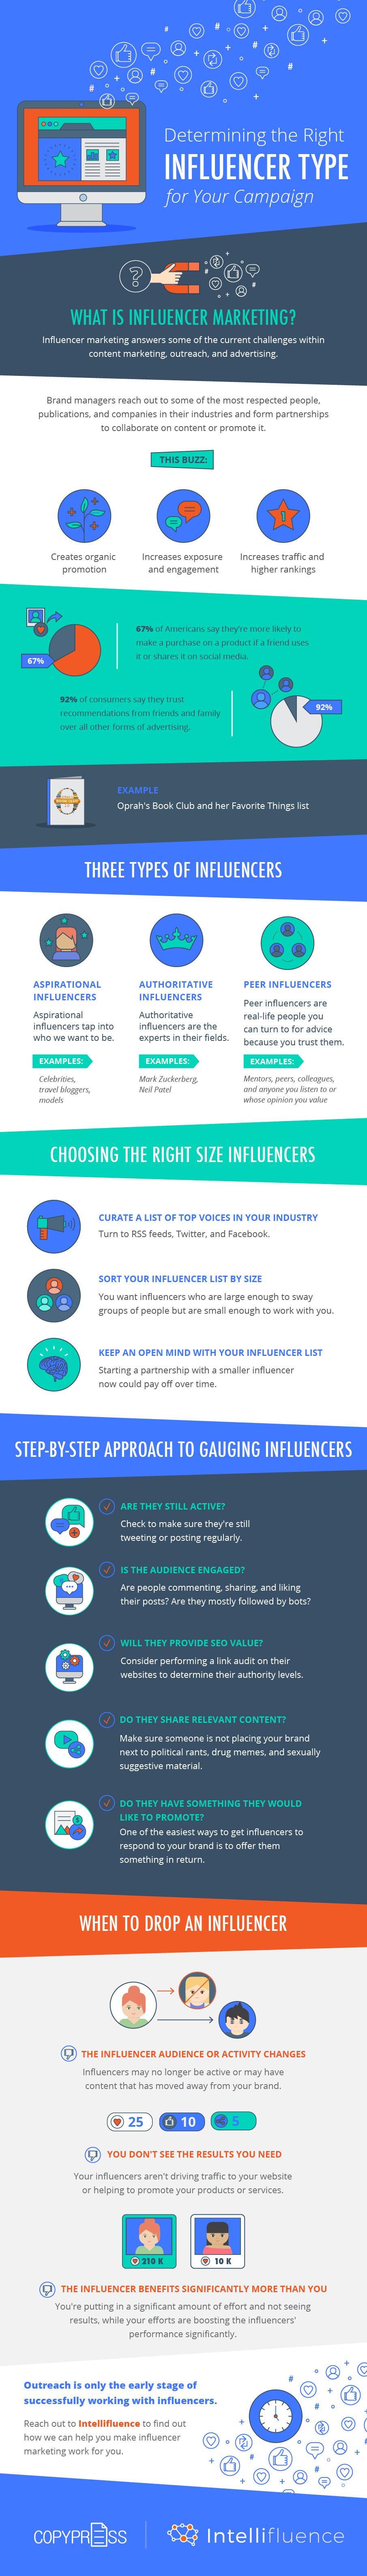 Influencer+Marketing+Infographic.jpeg